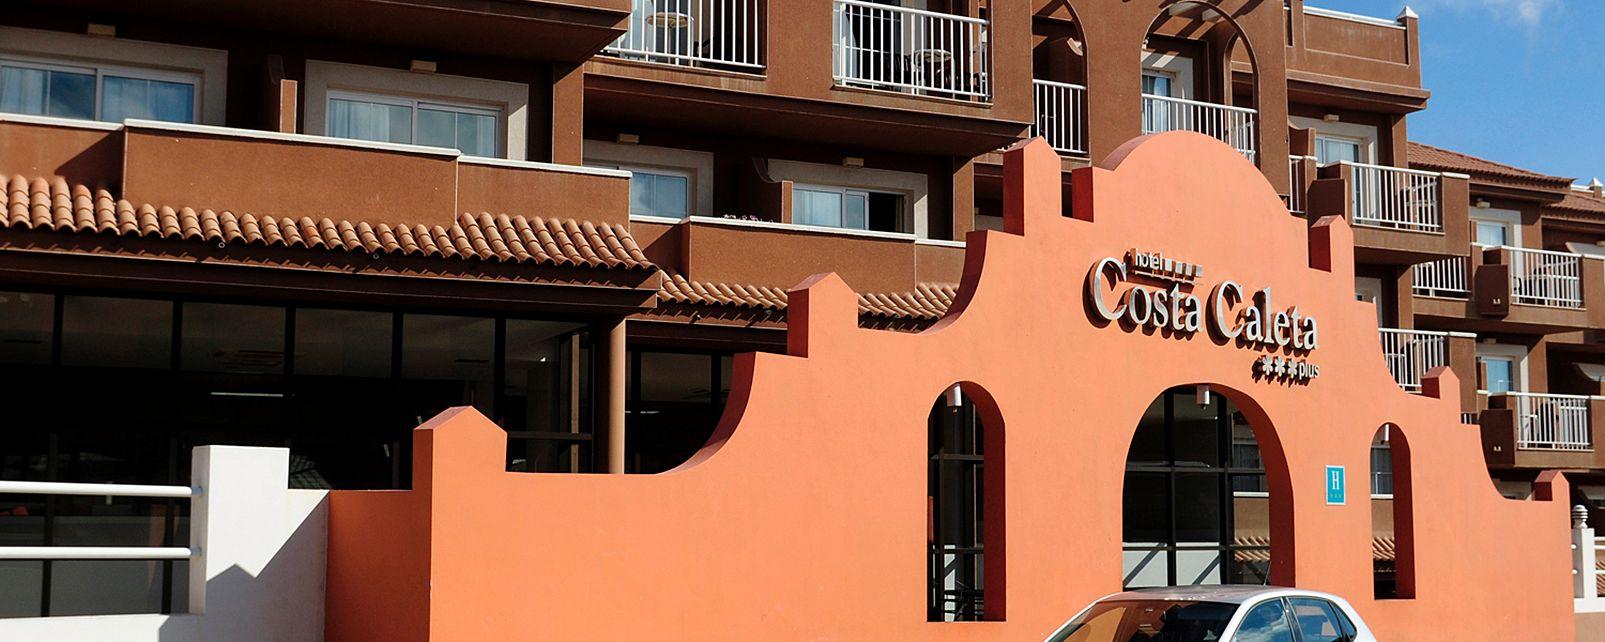 Hôtel Costa Caleta